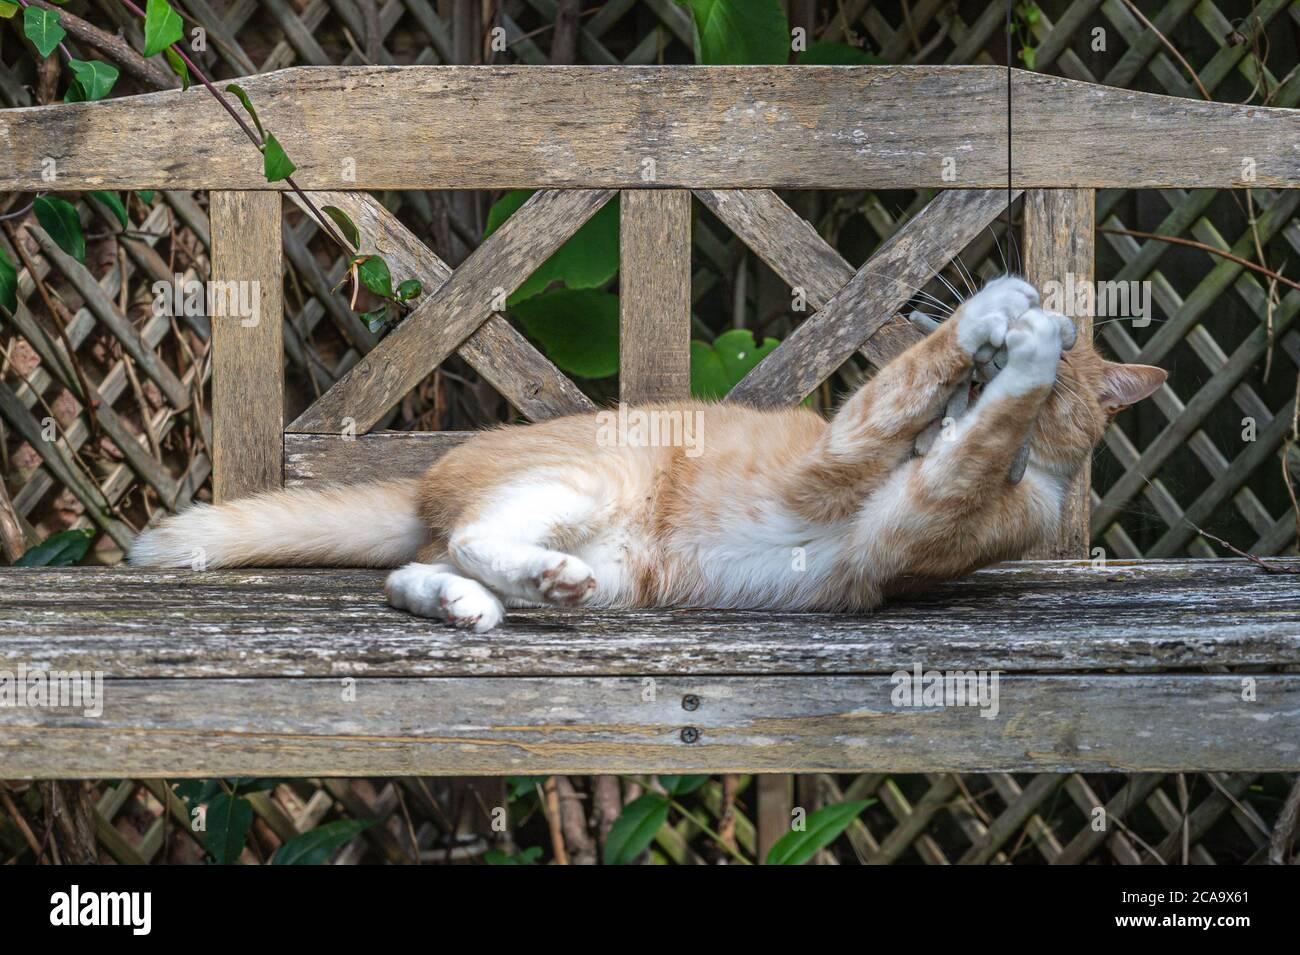 Juguetón gato jengibre en banco de madera con patas blancas alrededor de juguete gato Foto de stock